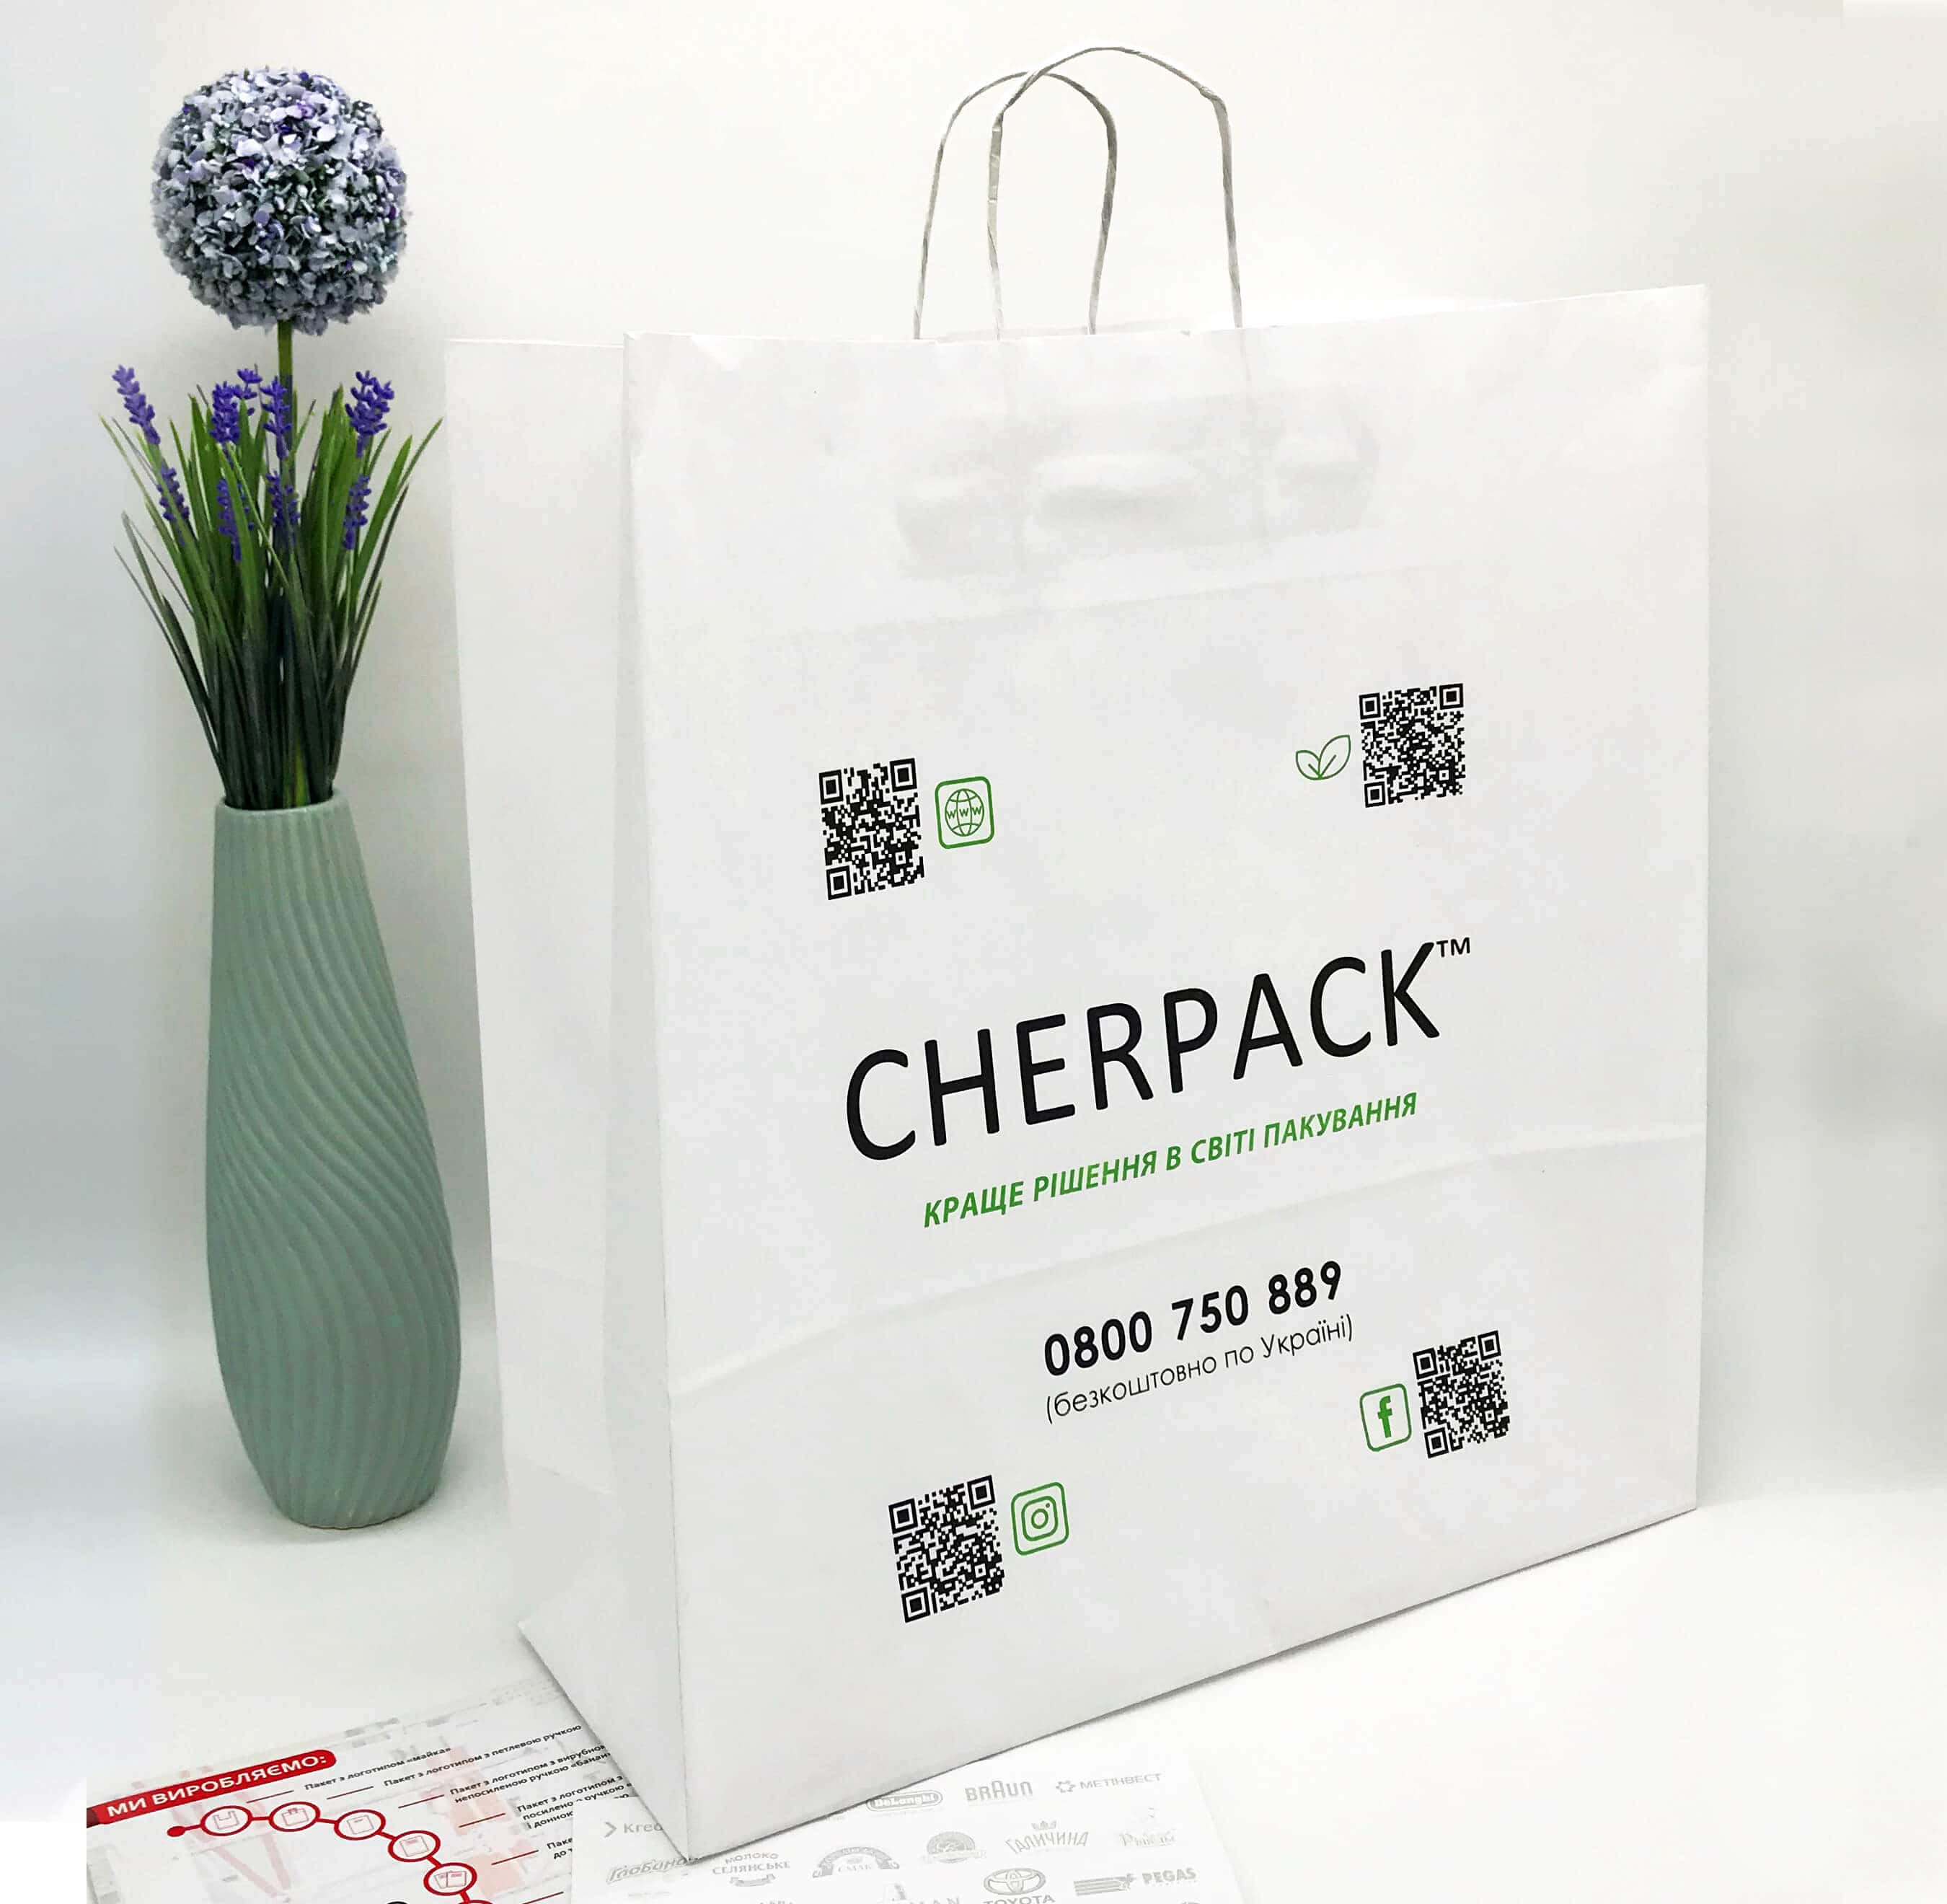 Белый крафт пакет с логотипом 450*480, 90 г/см -Chernigov Package - Фото Белый большой